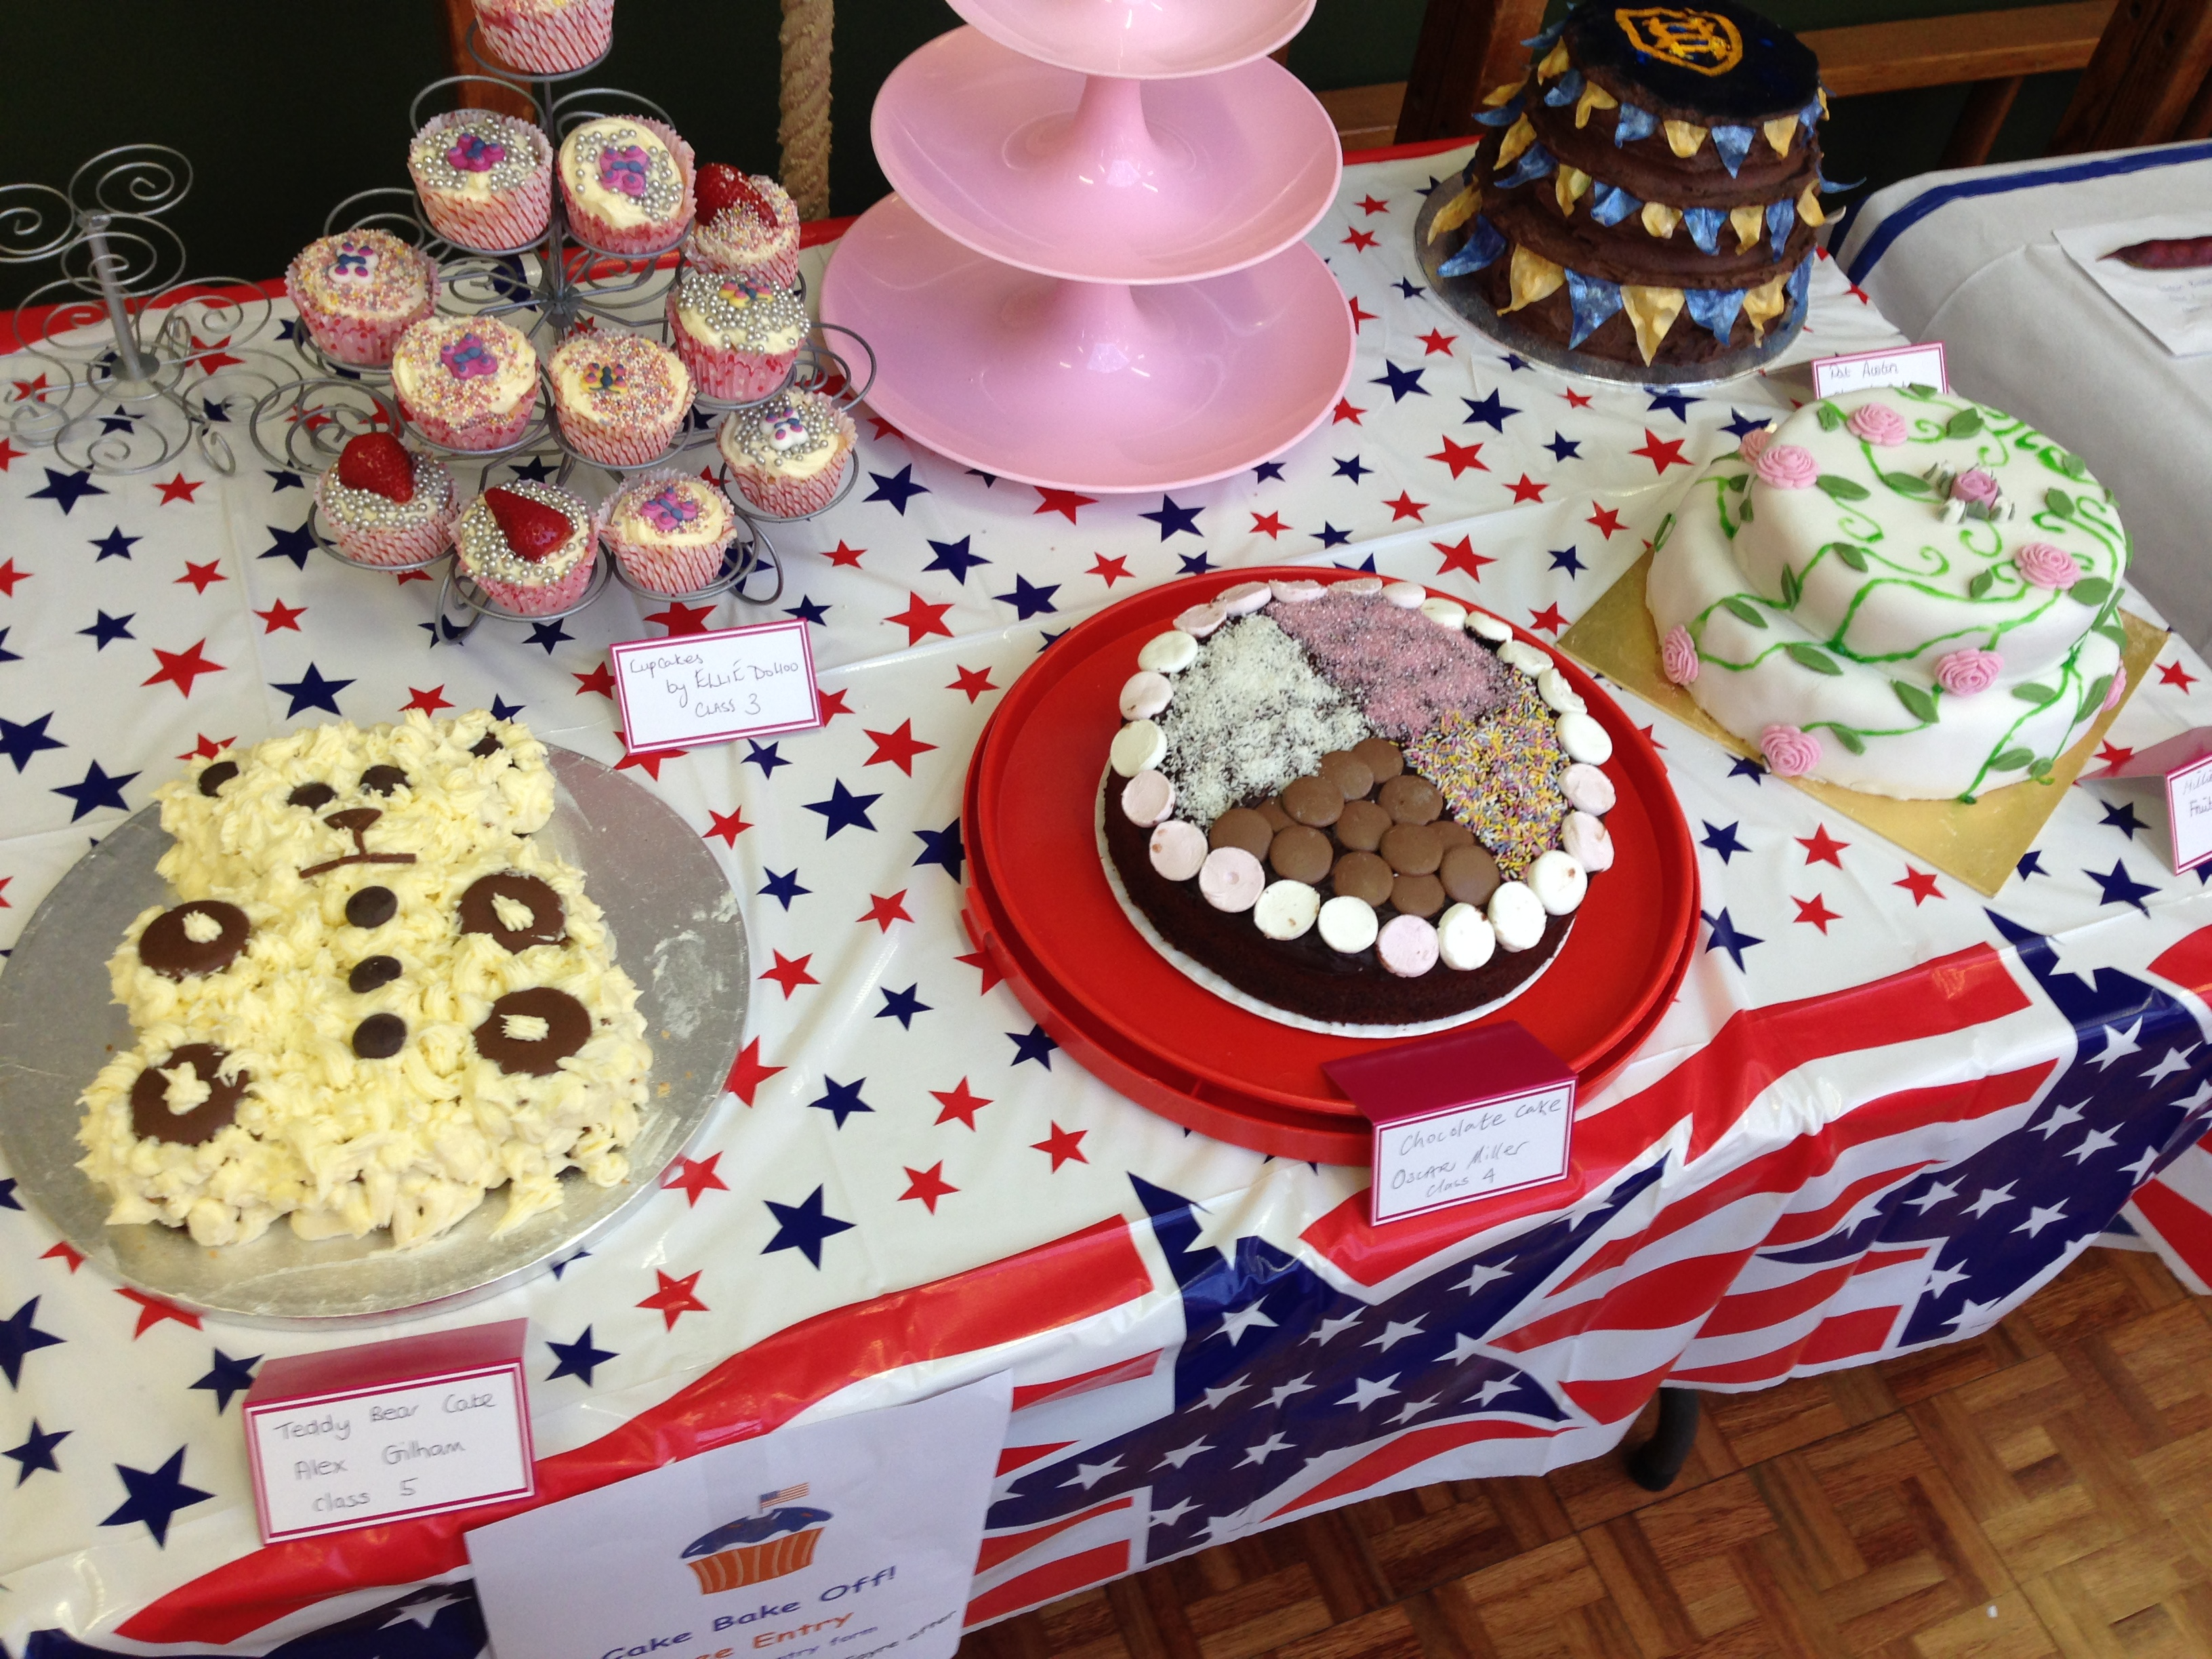 St Helens School Fayre - judging the Bake Off! - Phoenix FM